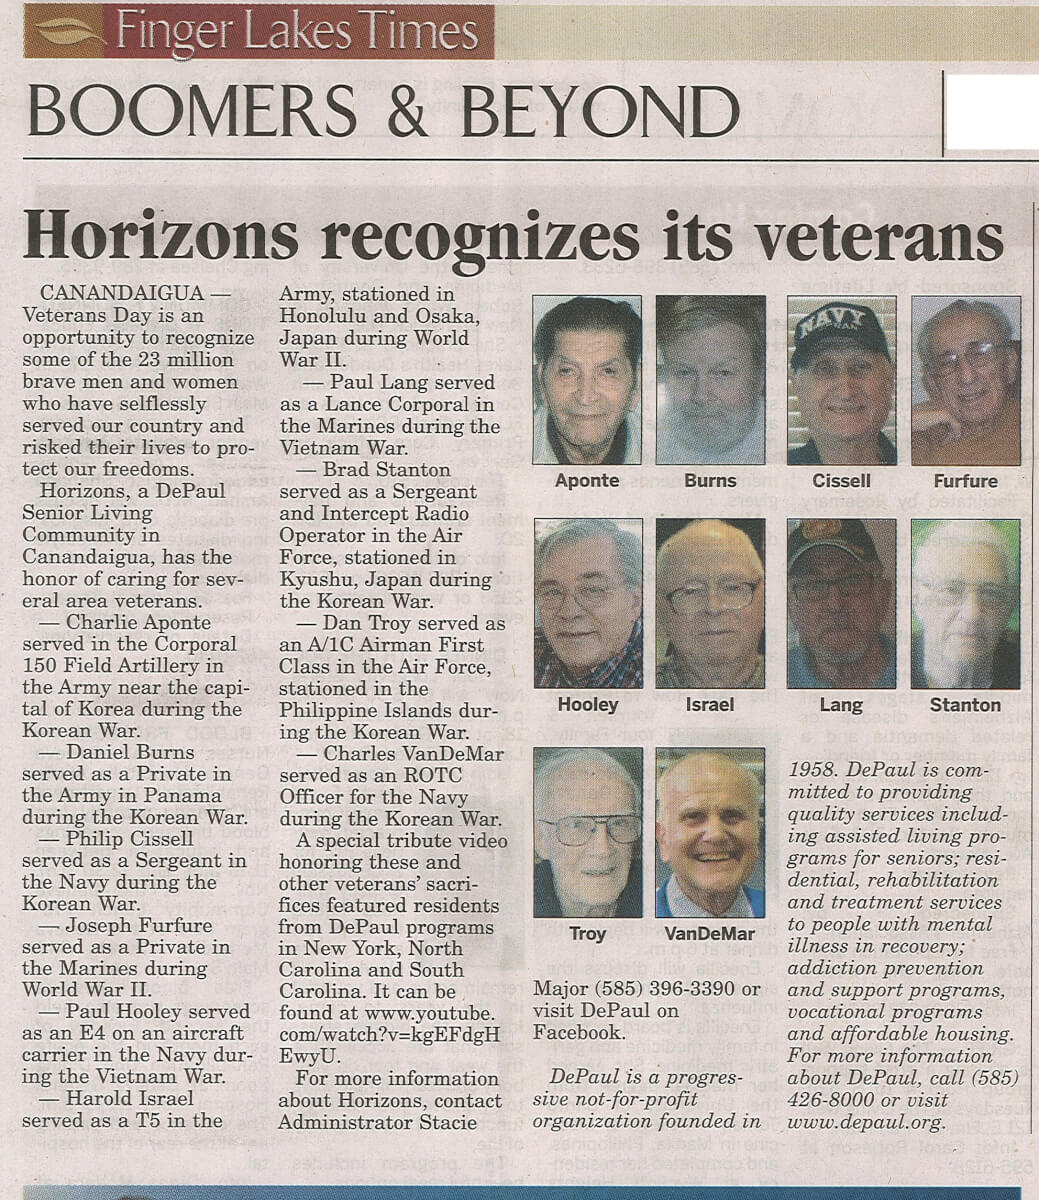 Horizons recognizes Veteran's Day in the Finger Lankes Times November 15, 2015